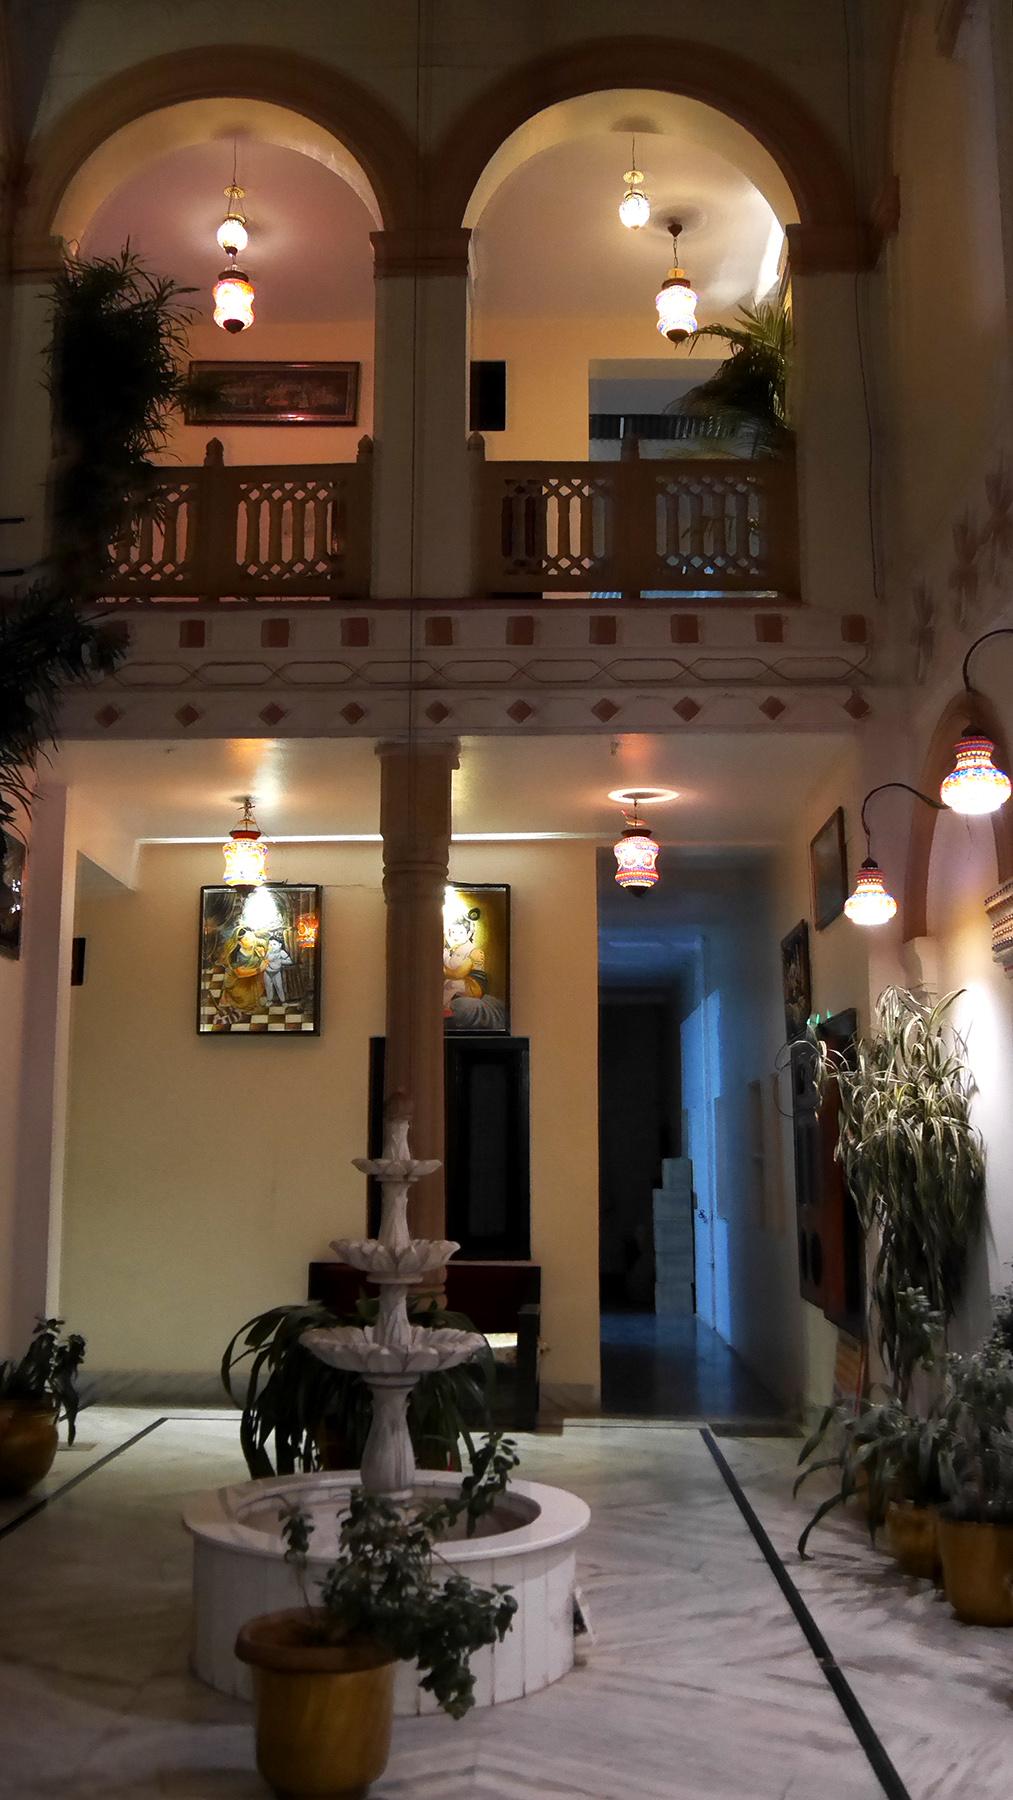 Lobby of Kanhaia Haveli